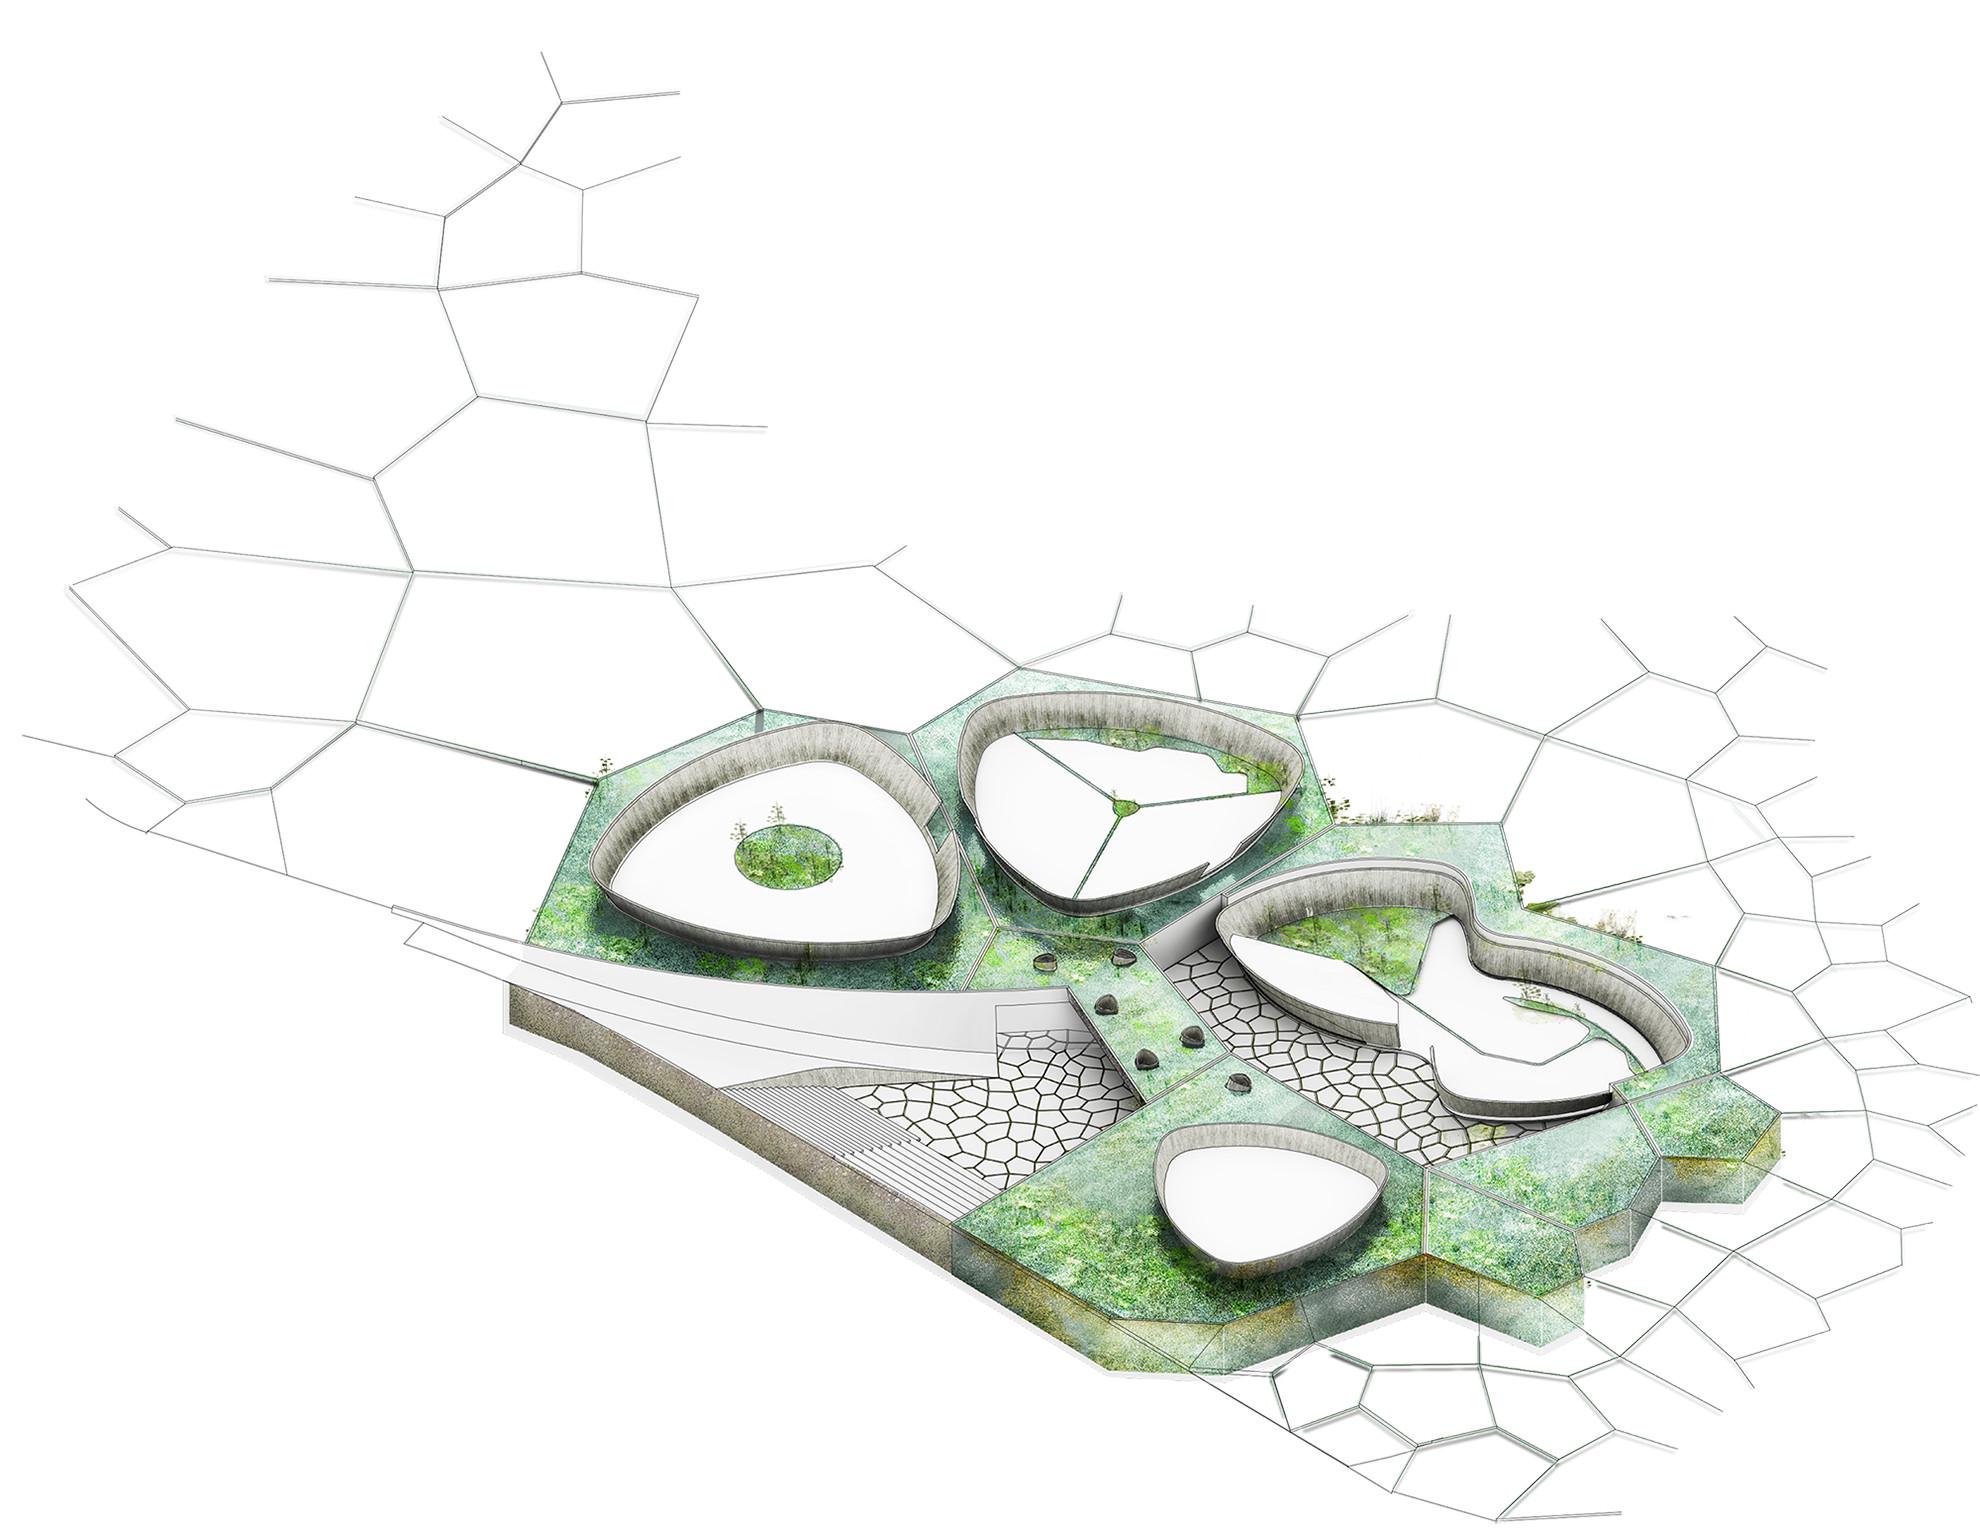 Humedal. Image Courtesy of De Arquitectura y Paisaje